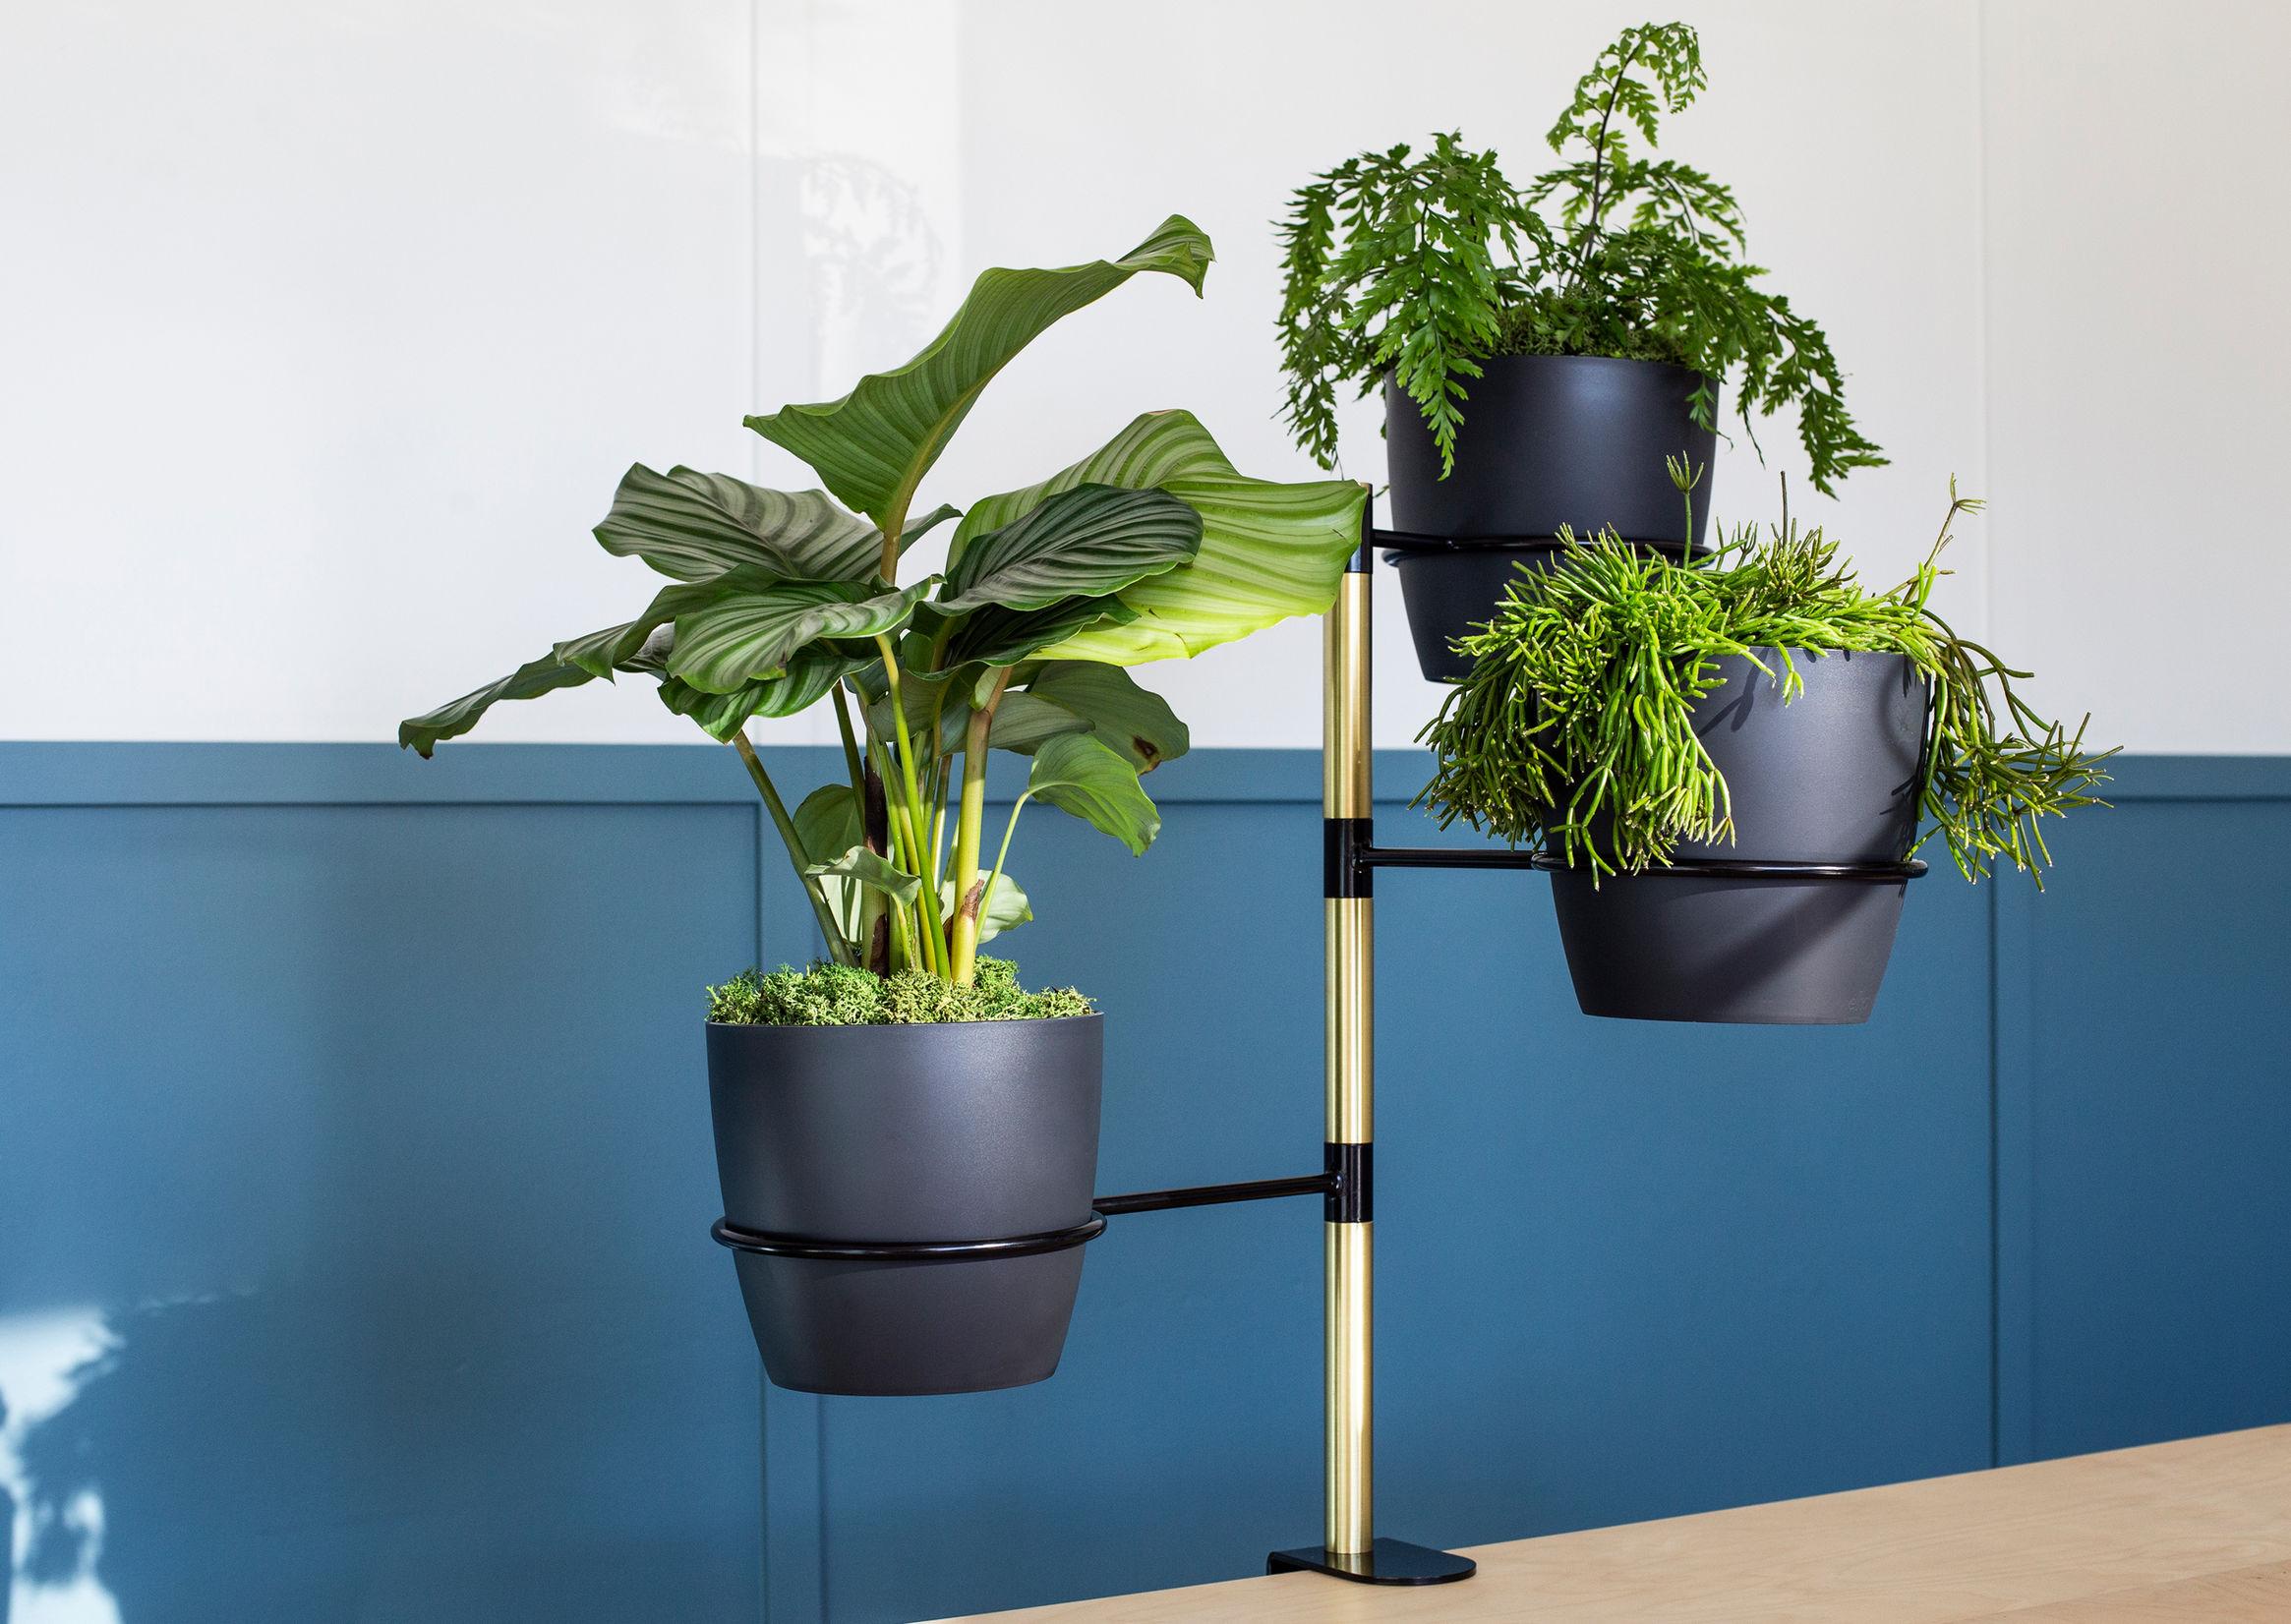 Plant orbit 9-0-2344-0-1652